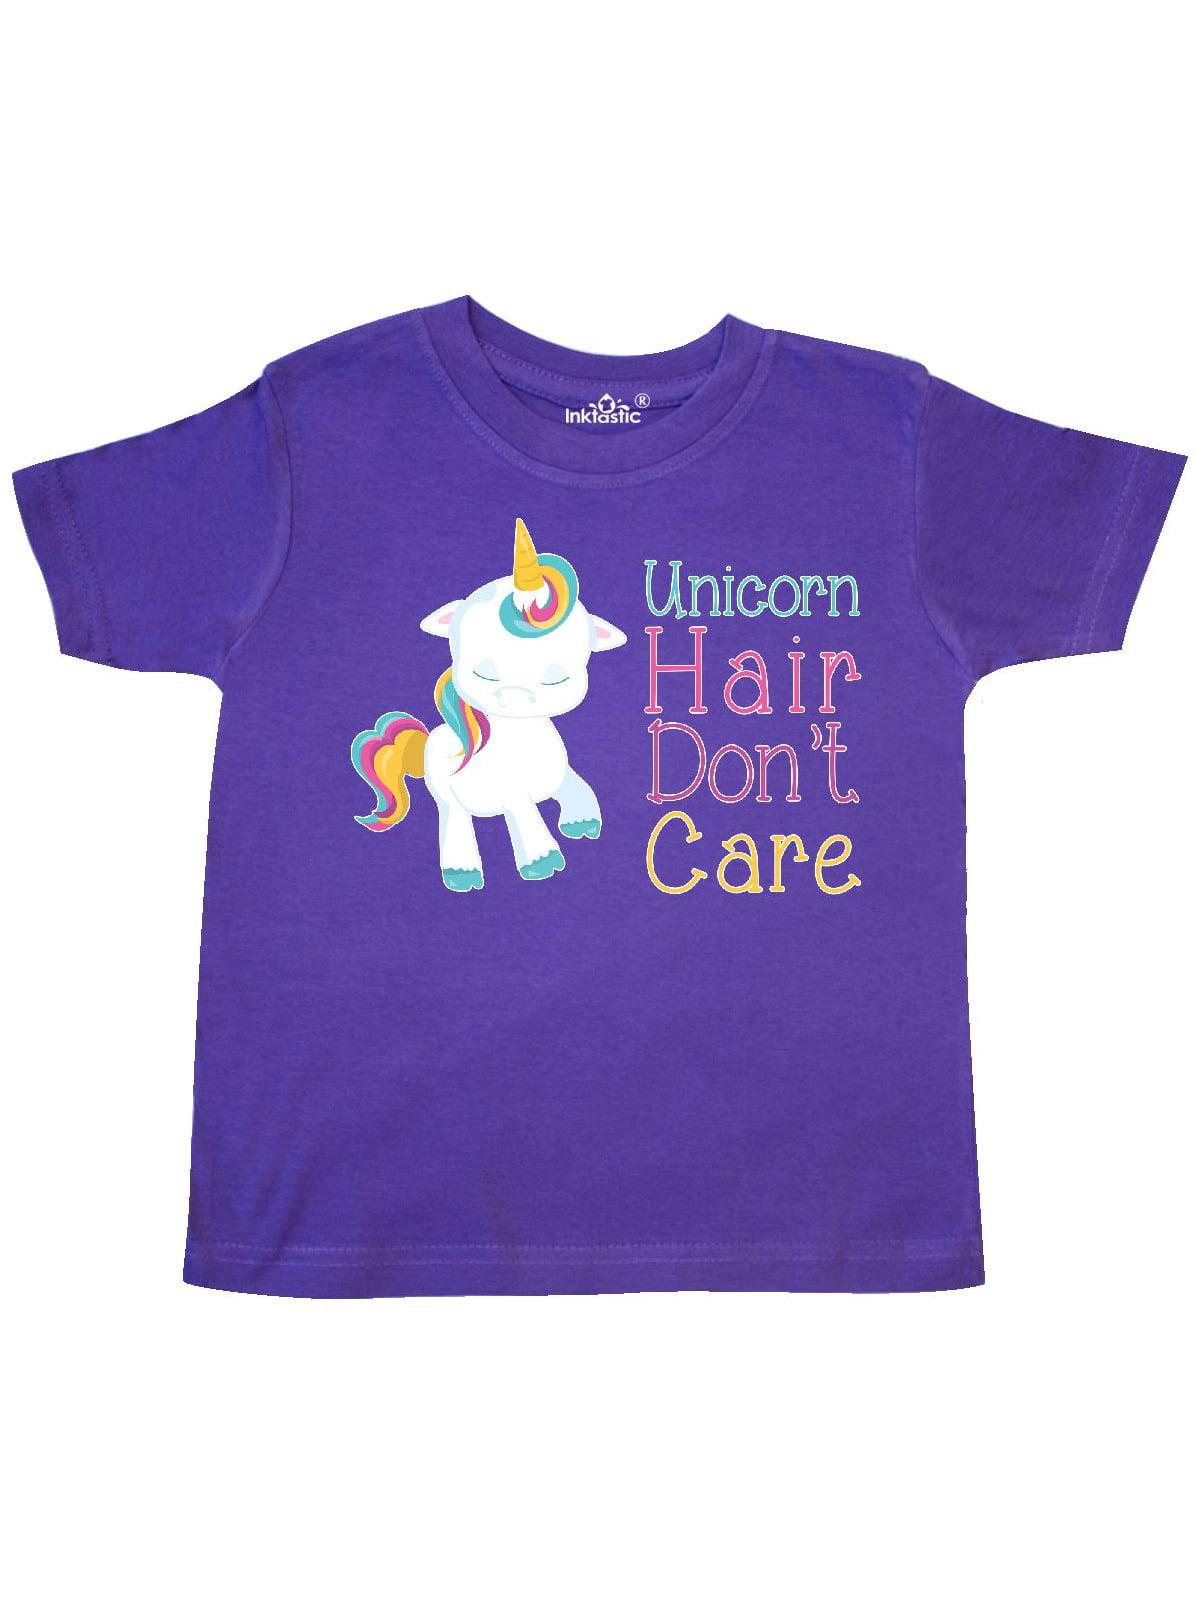 Unicorn Hair, Don't Care Toddler T-Shirt